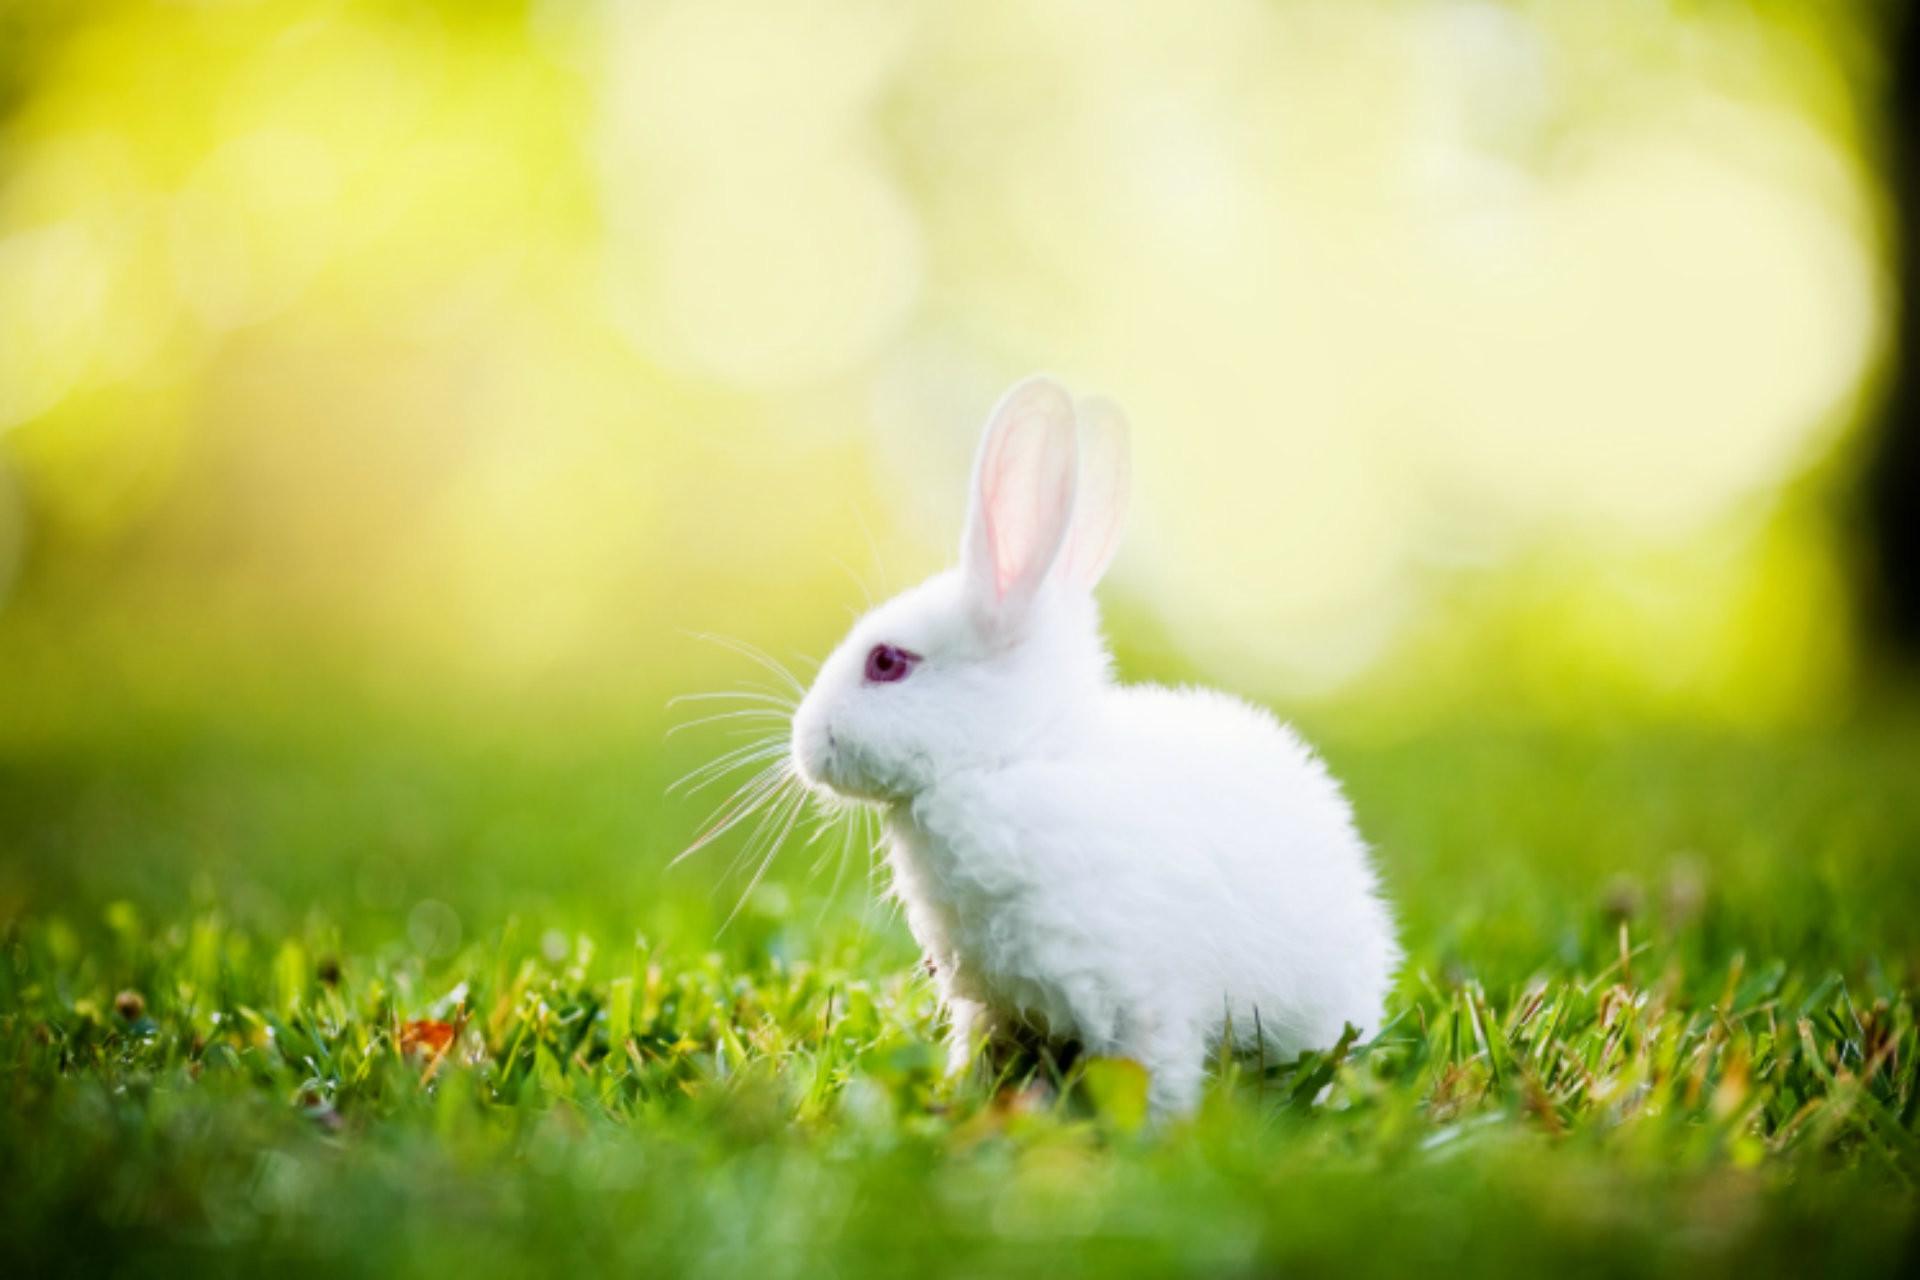 rabbit wallpaper,domestic rabbit,rabbit,rabbits and hares,grass,hare